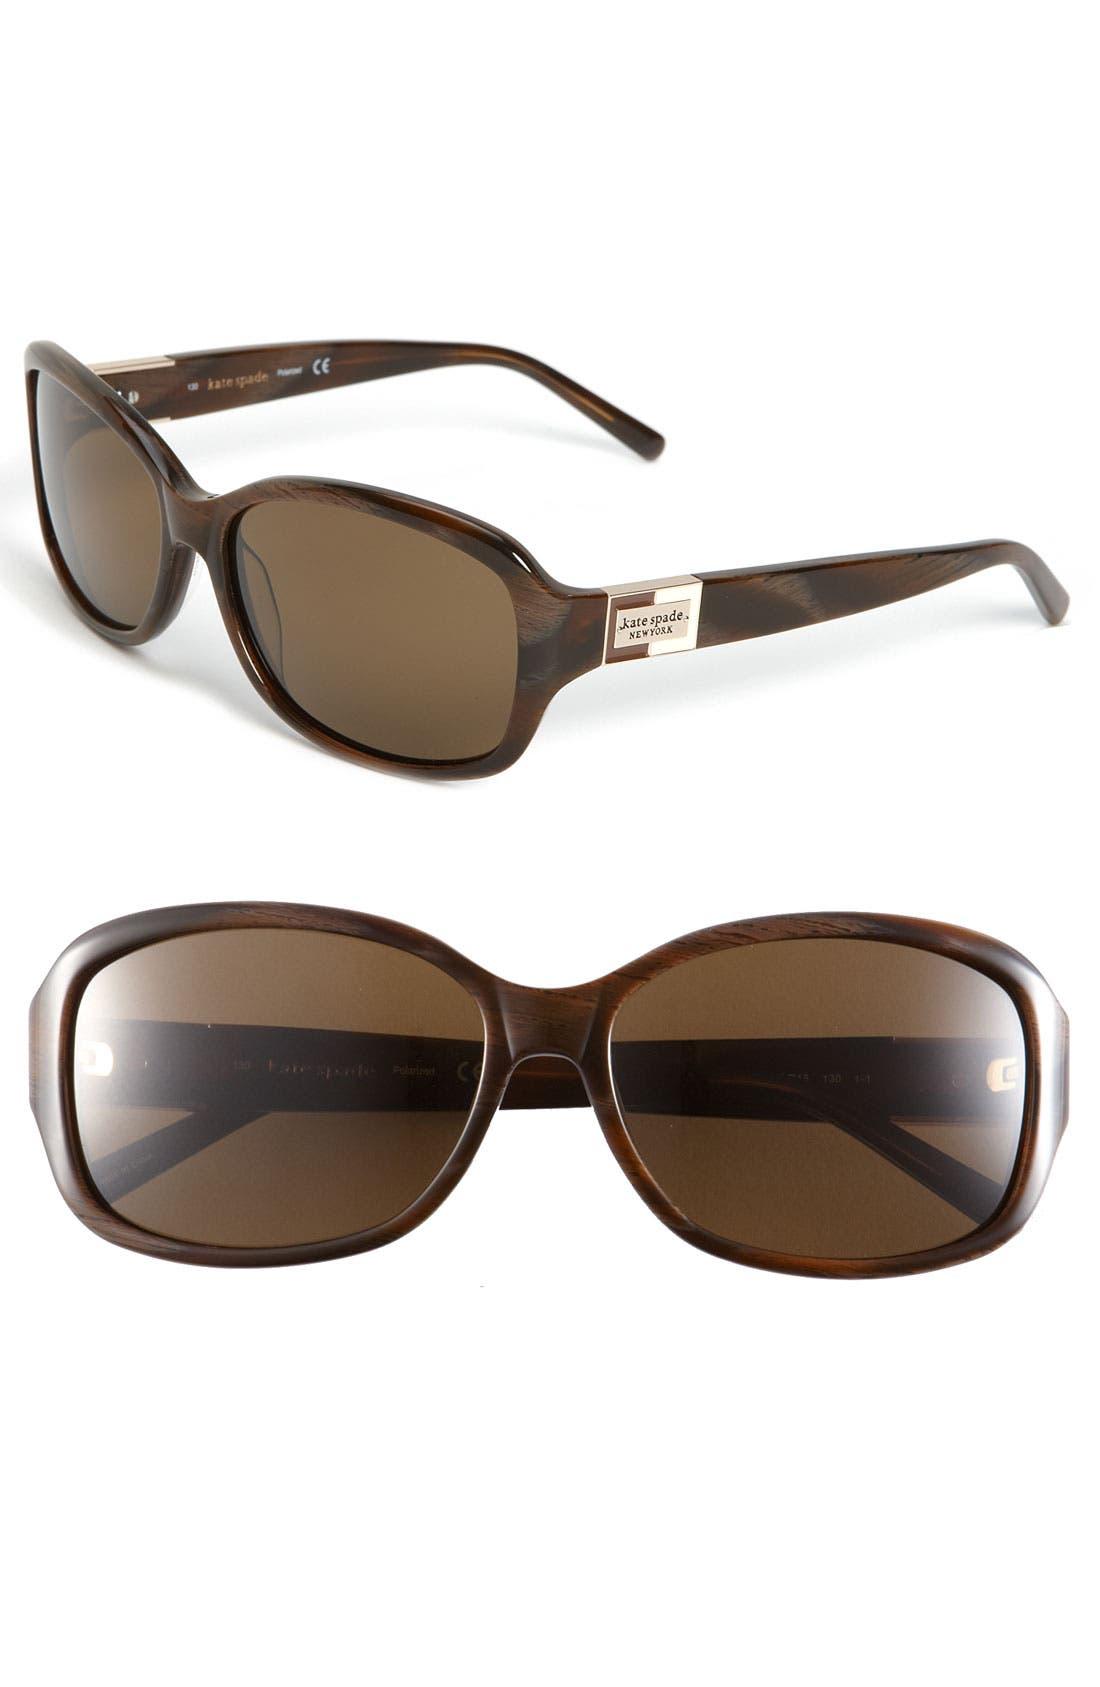 Alternate Image 1 Selected - kate spade new york 'annika' 56mm polarized rectangular sunglasses